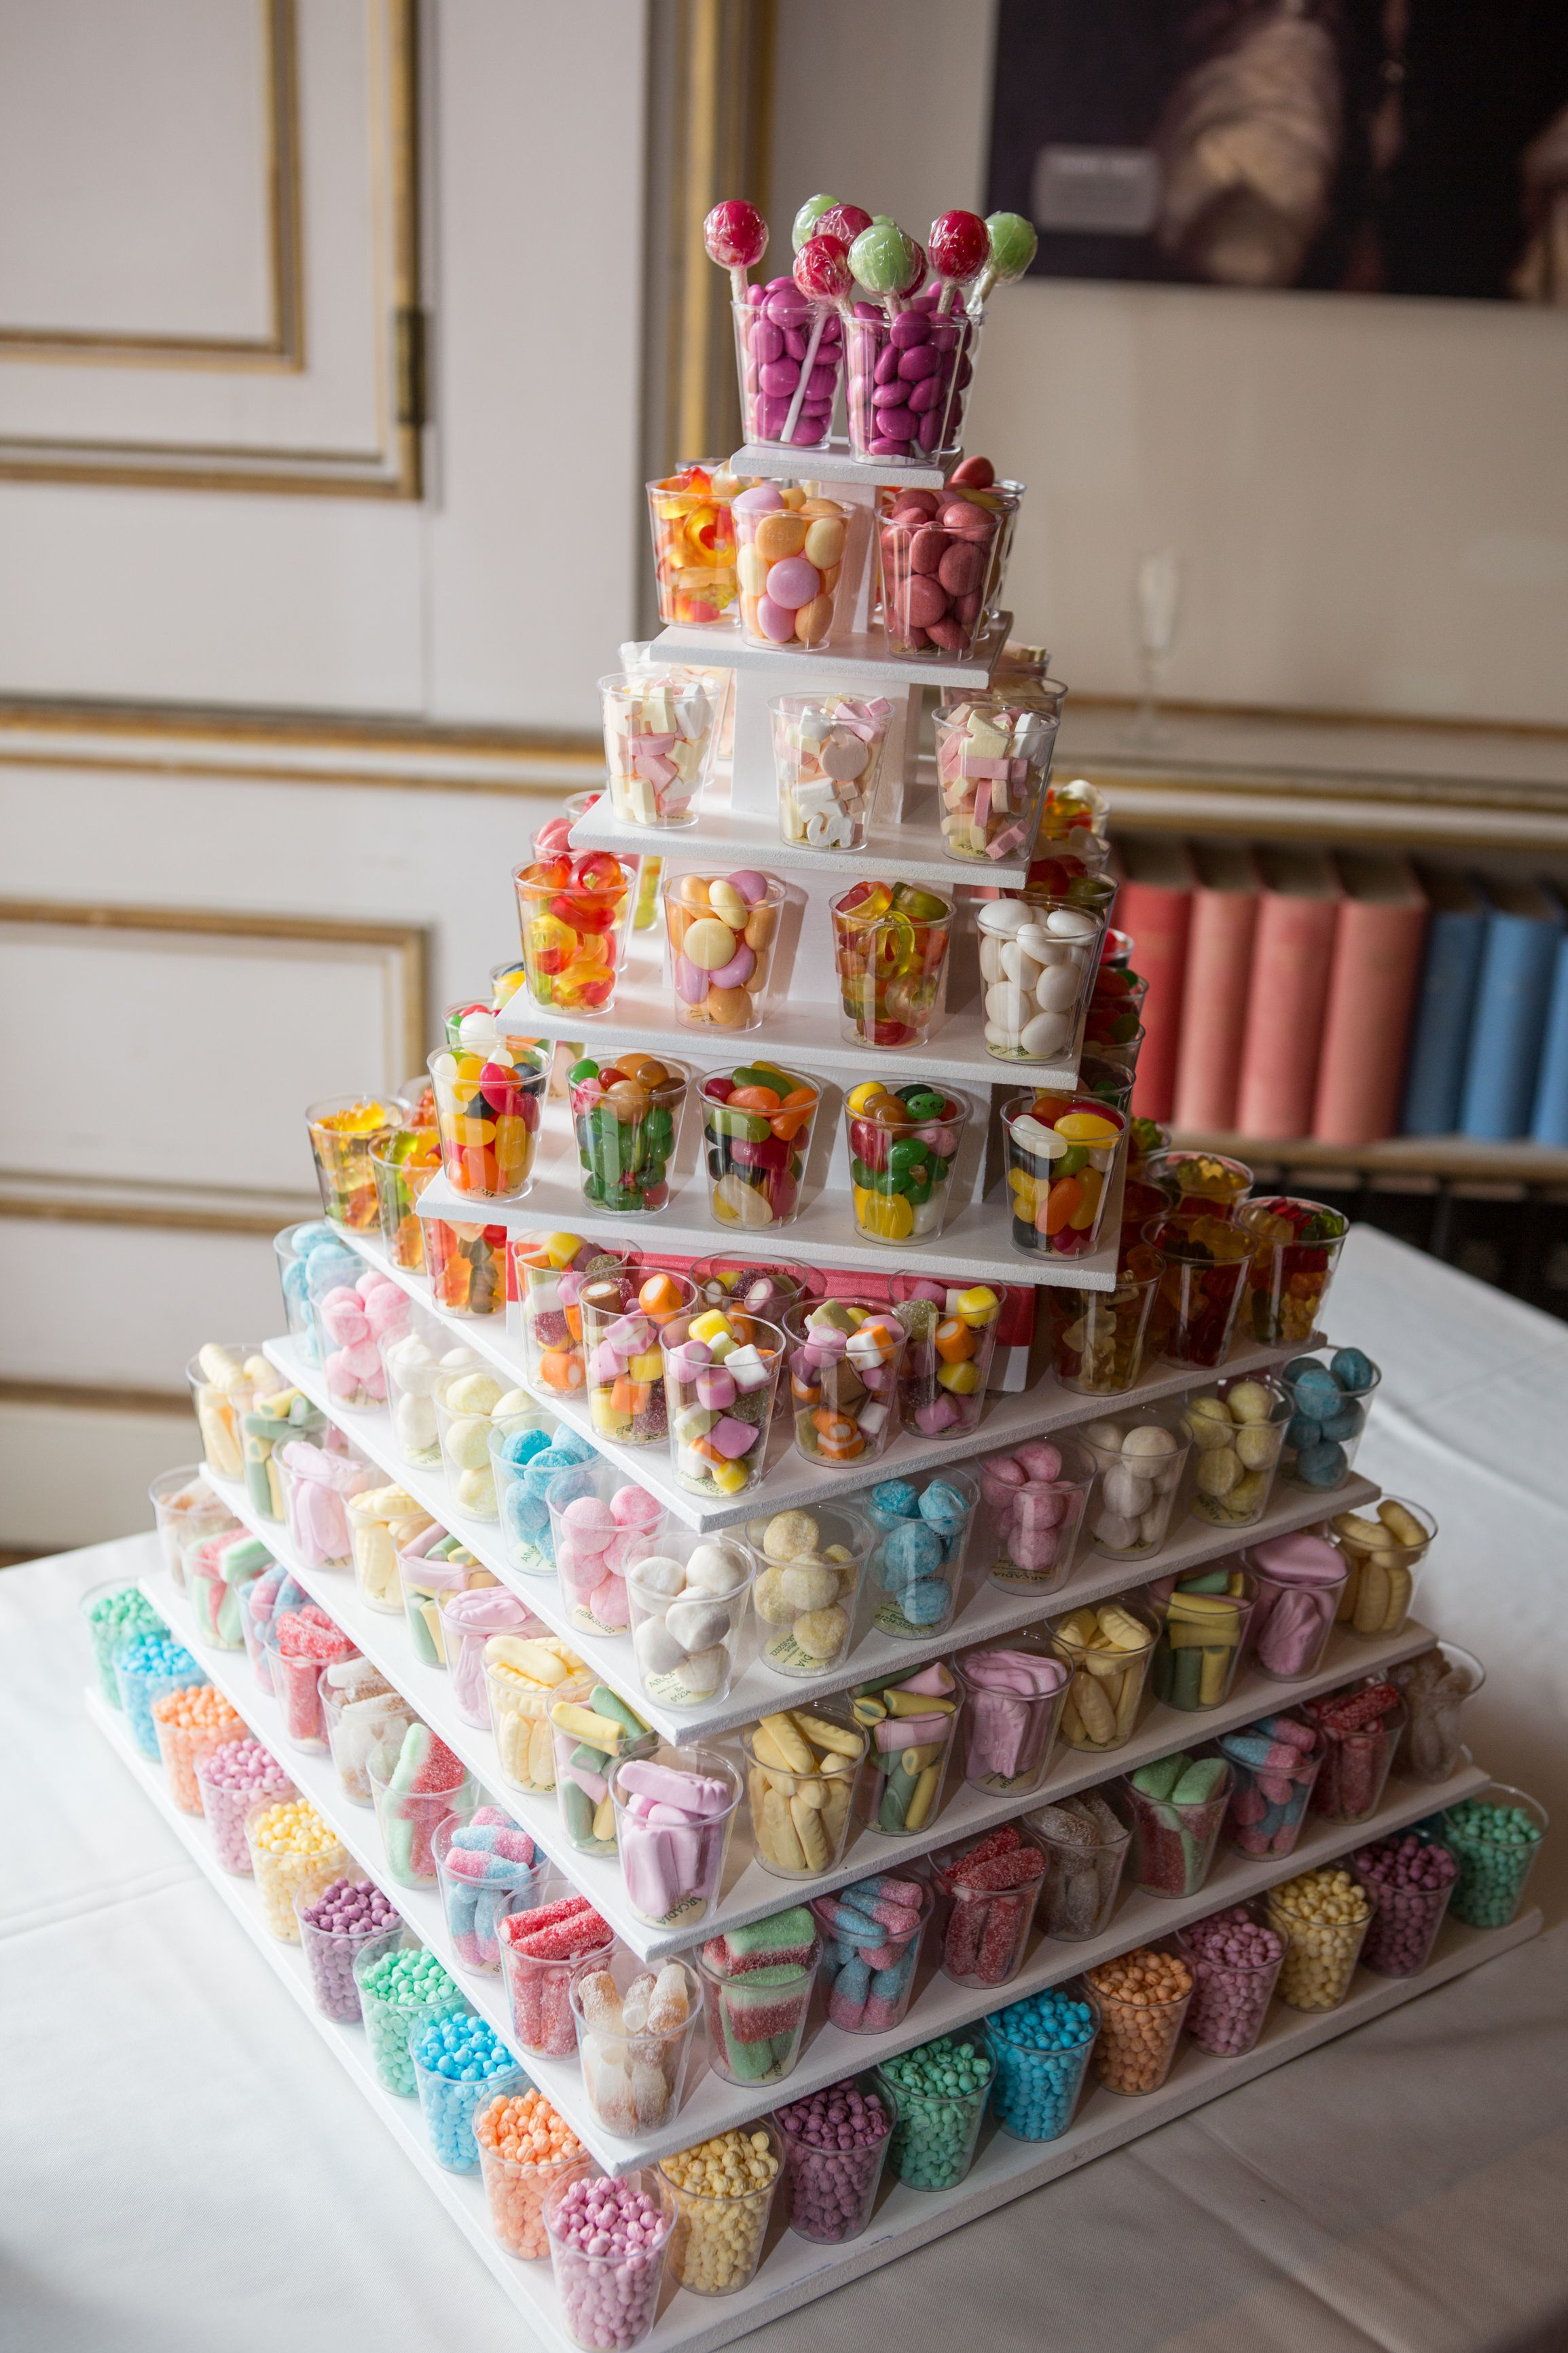 Sweetie Wedding Cake Wedding Cake Alternatives Sweetie Birthday Cake Alternative Wedding Cakes